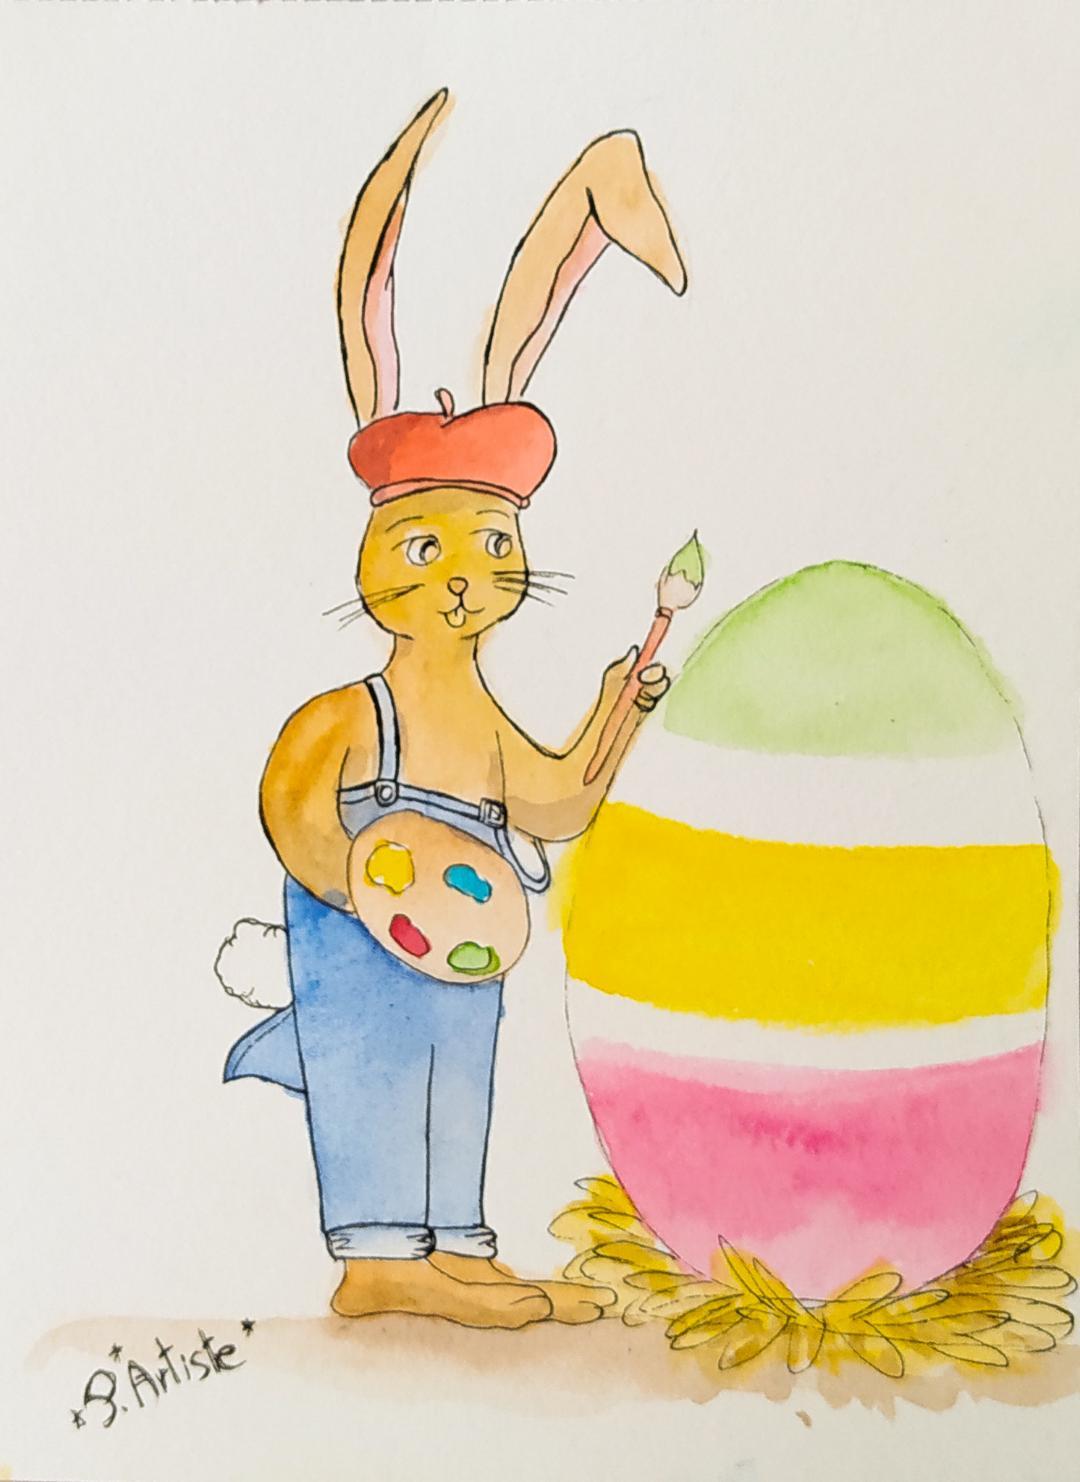 Illustration d'un lapin peignant un oeuf